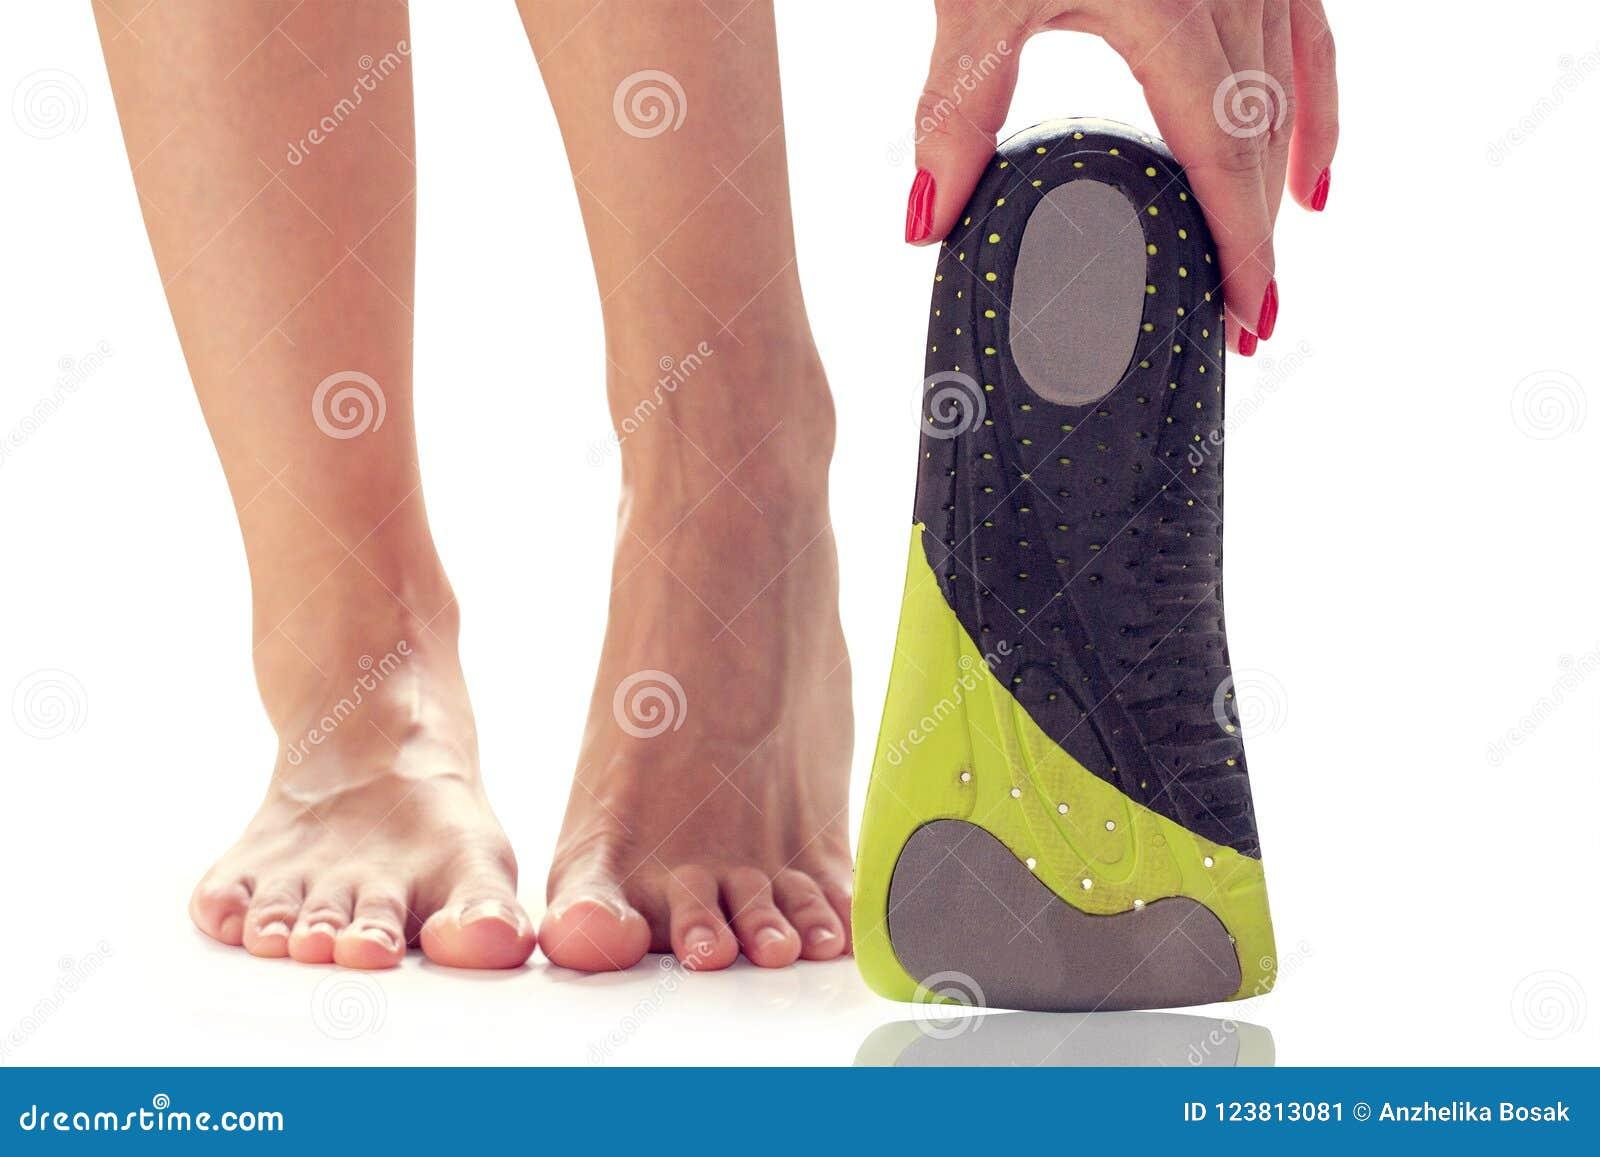 Feet and orthopedic insole